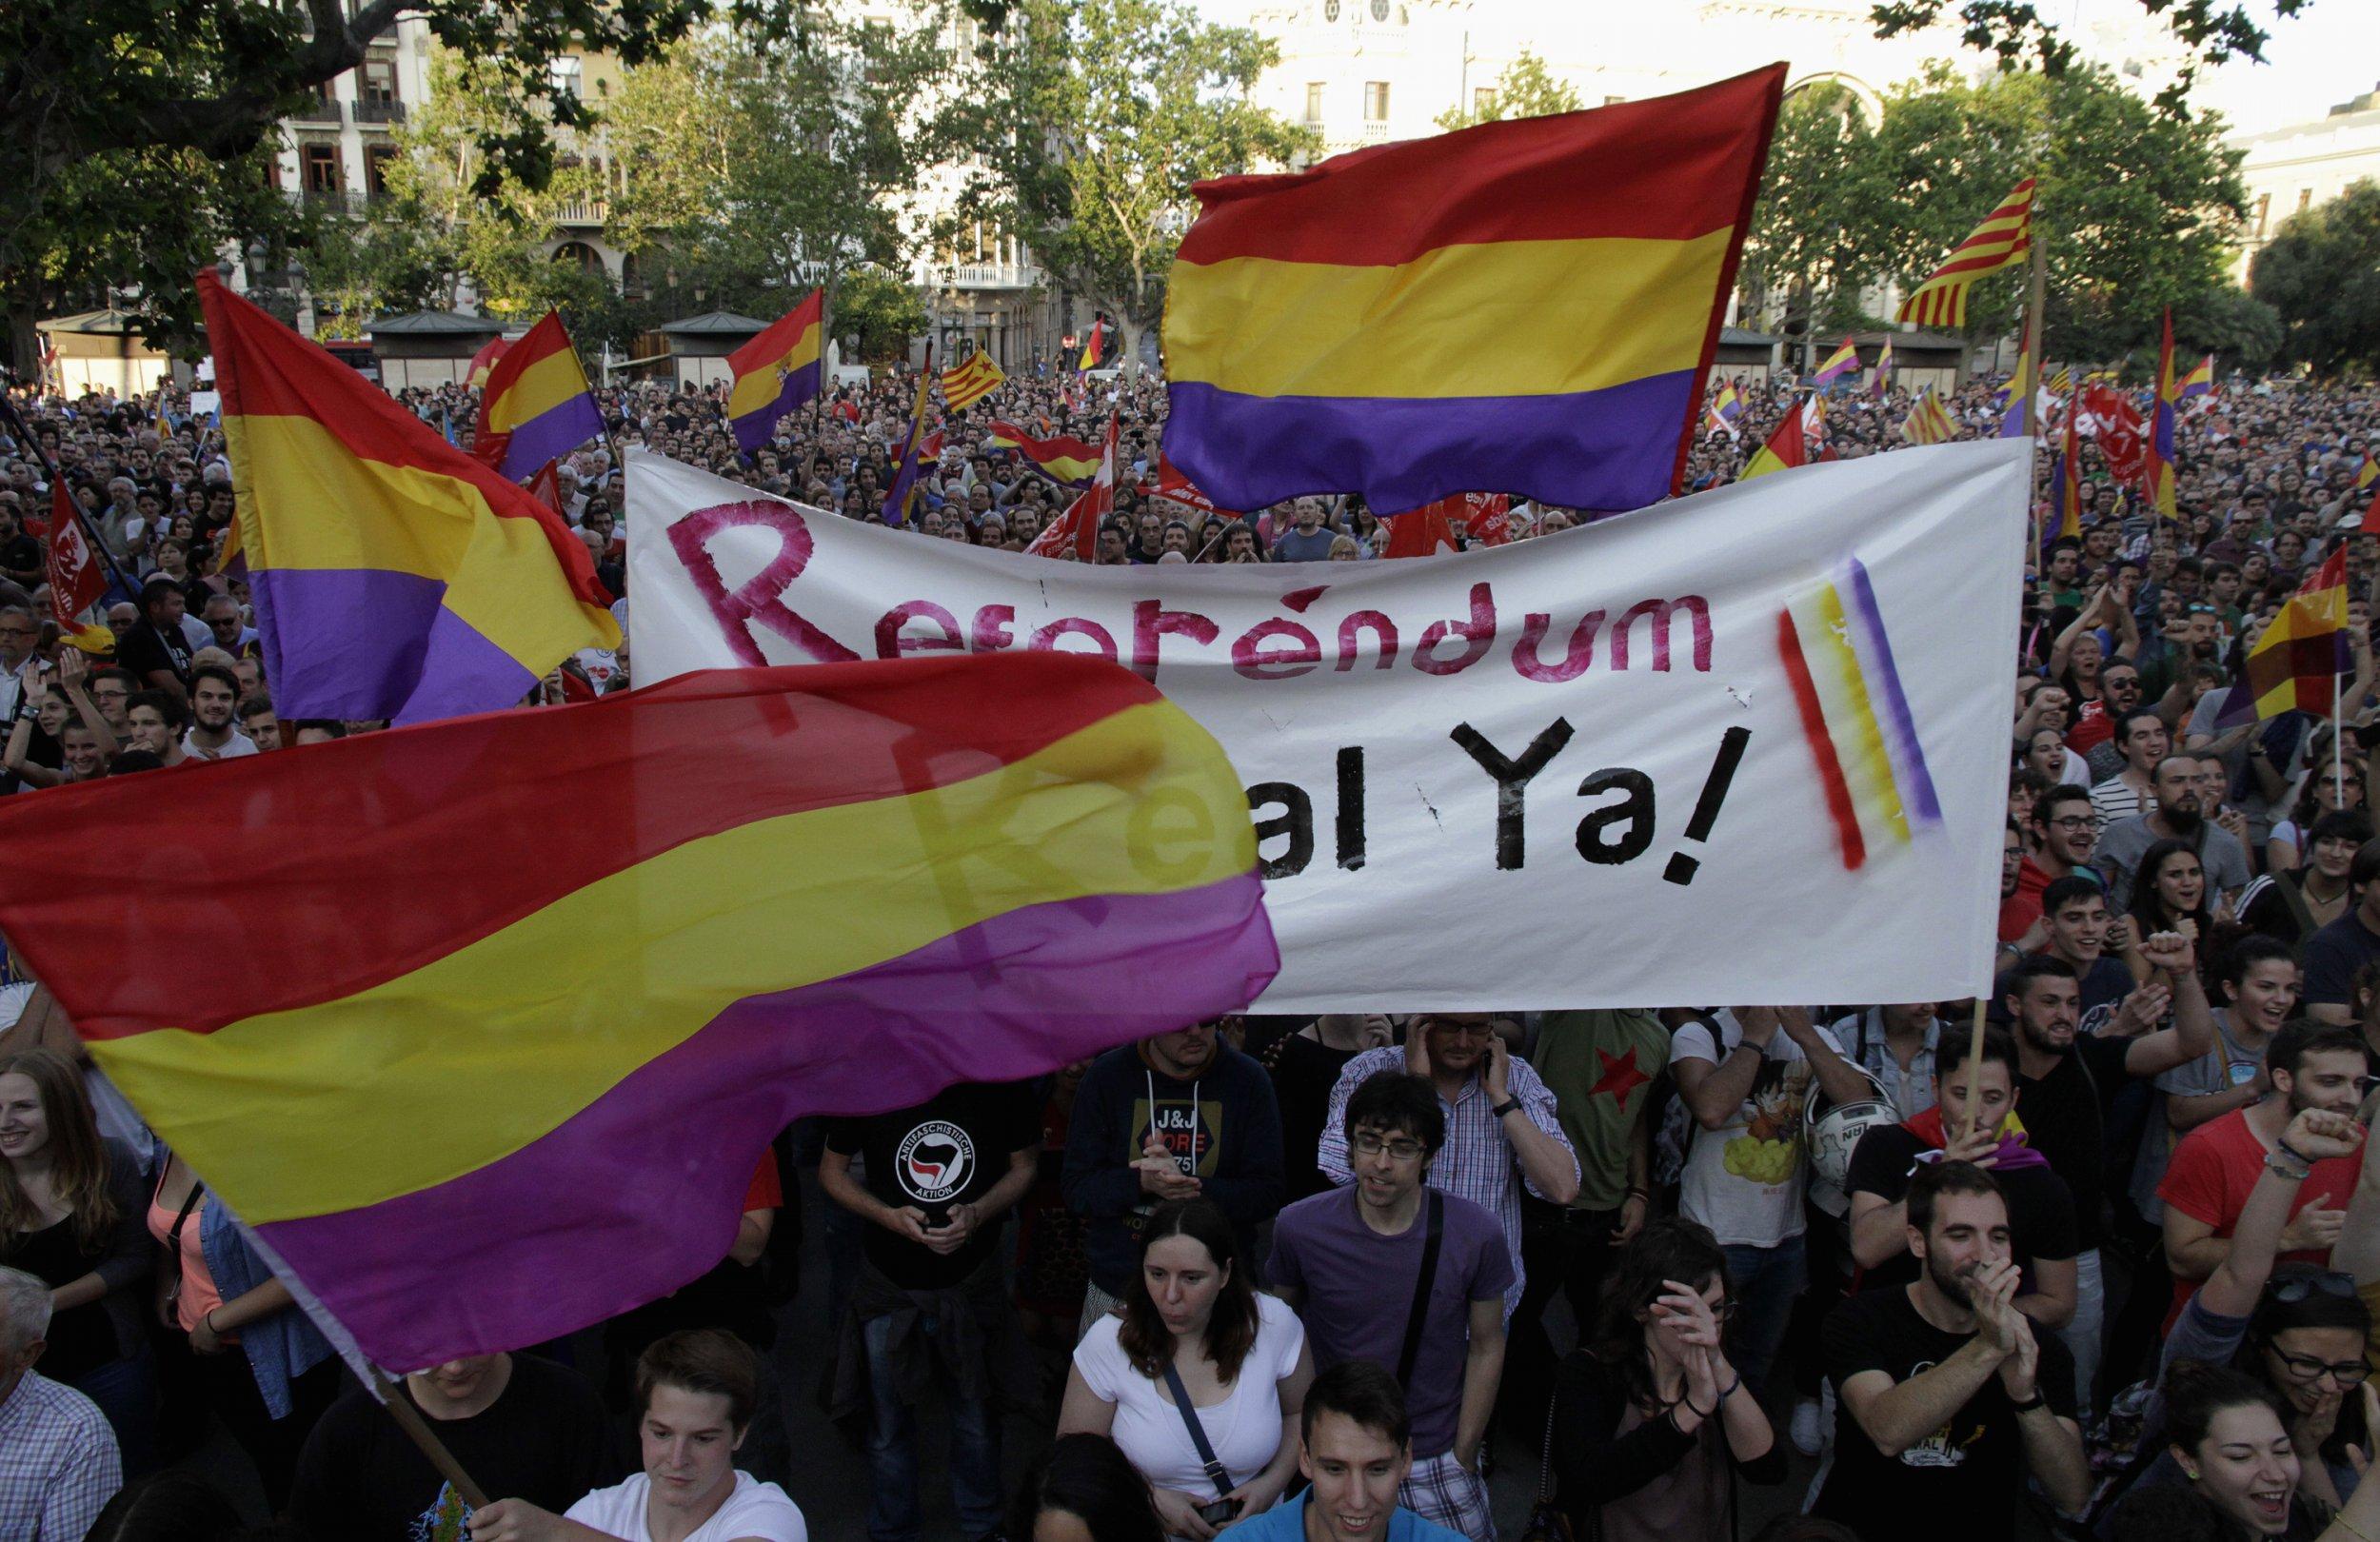 Valencia Anti-Royalist Protest